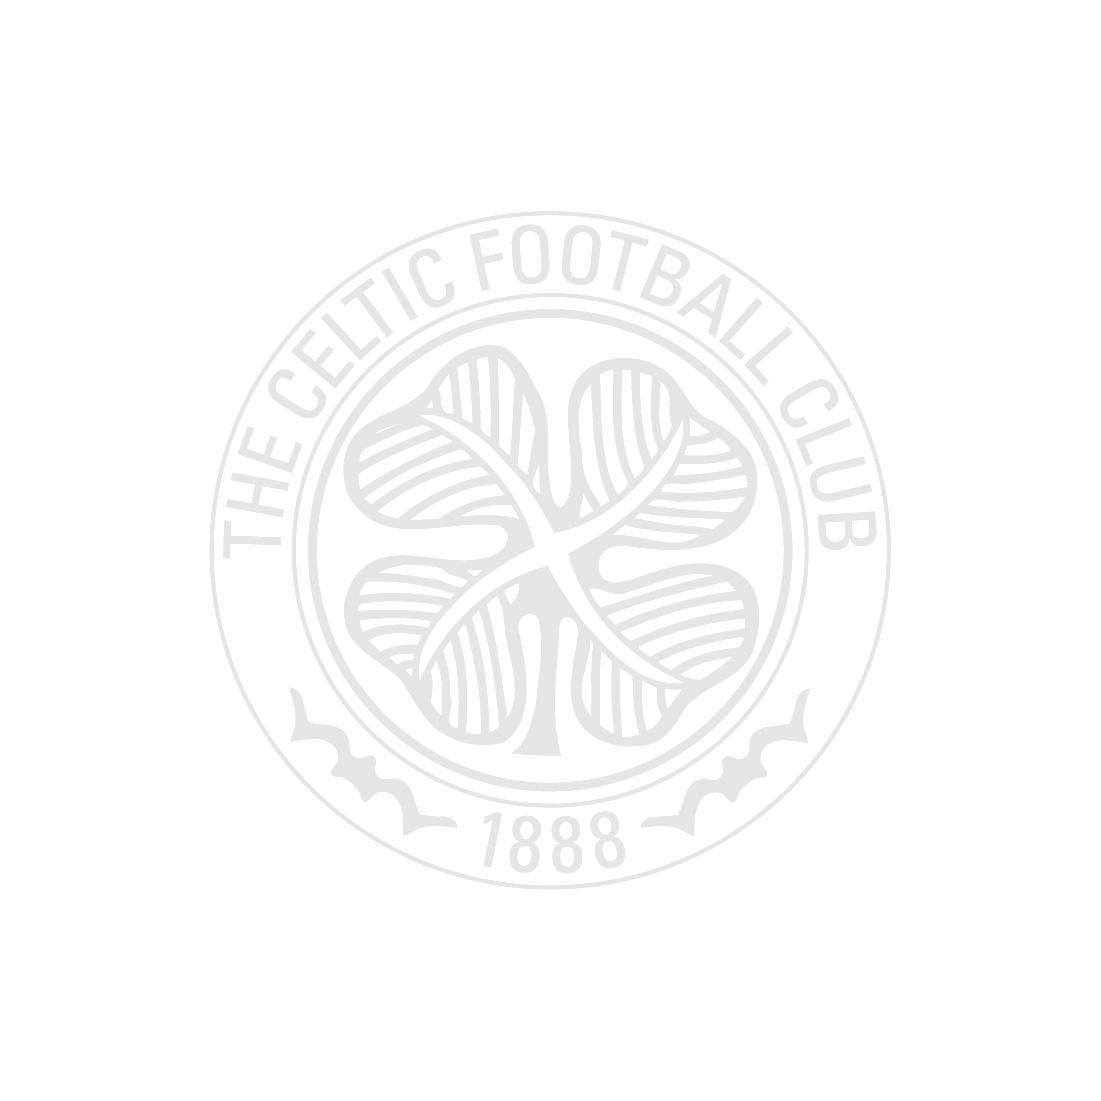 Celtic FC Stats Poster